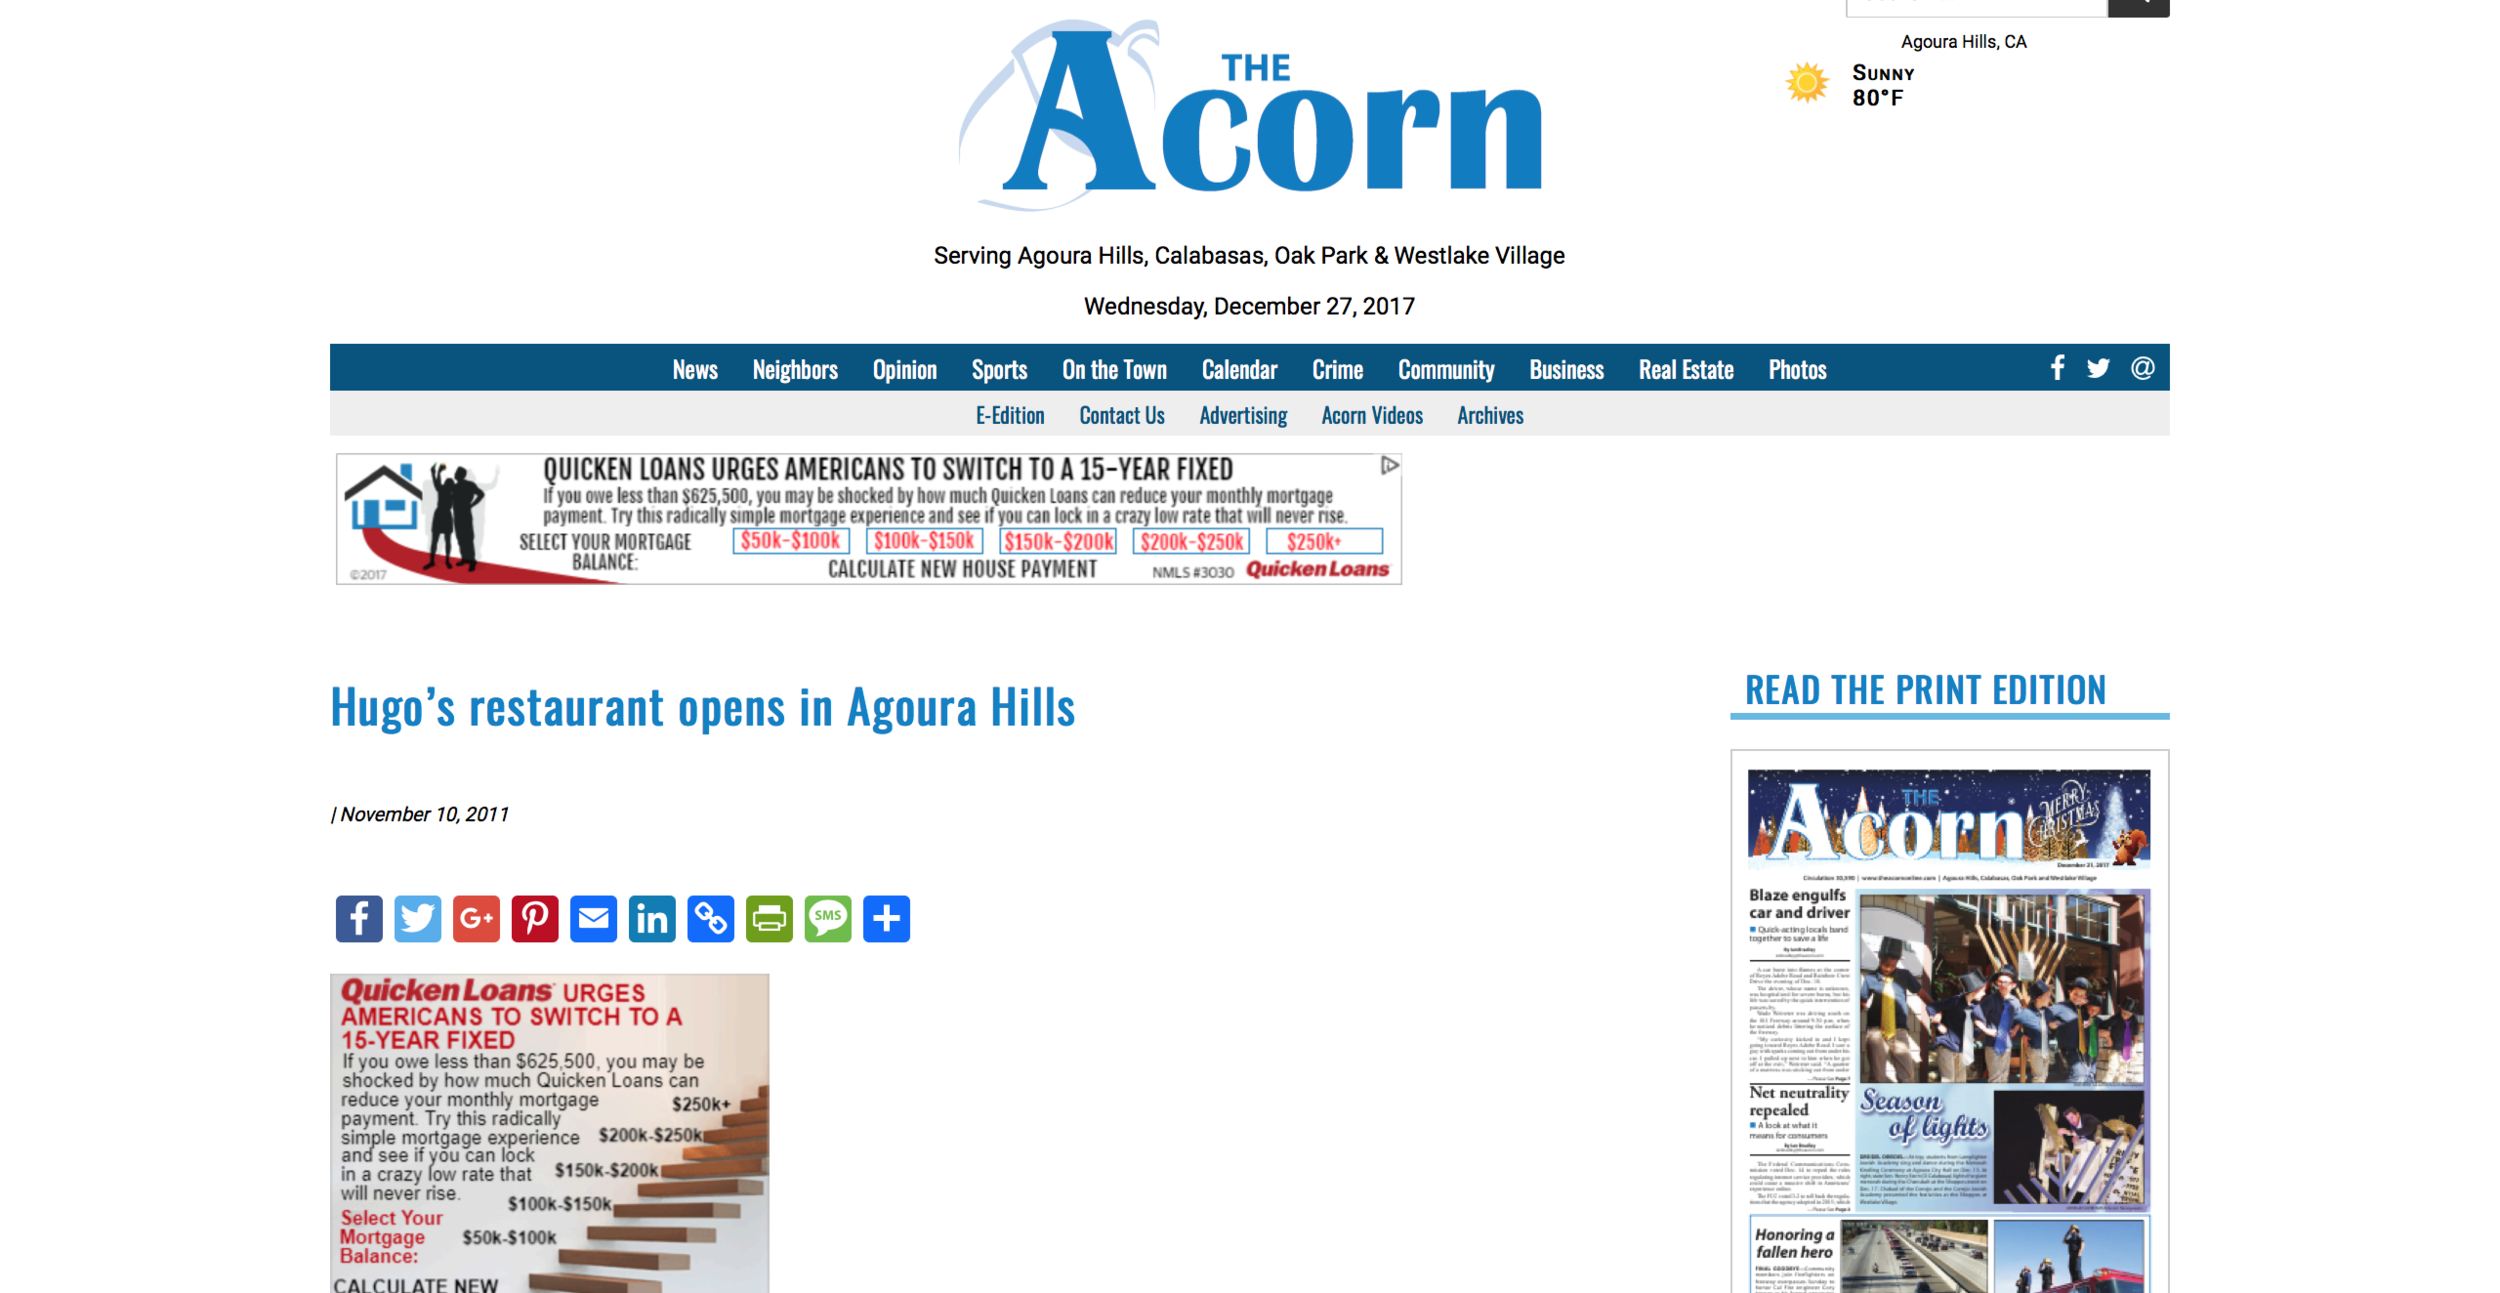 The Acorn - Hugo's